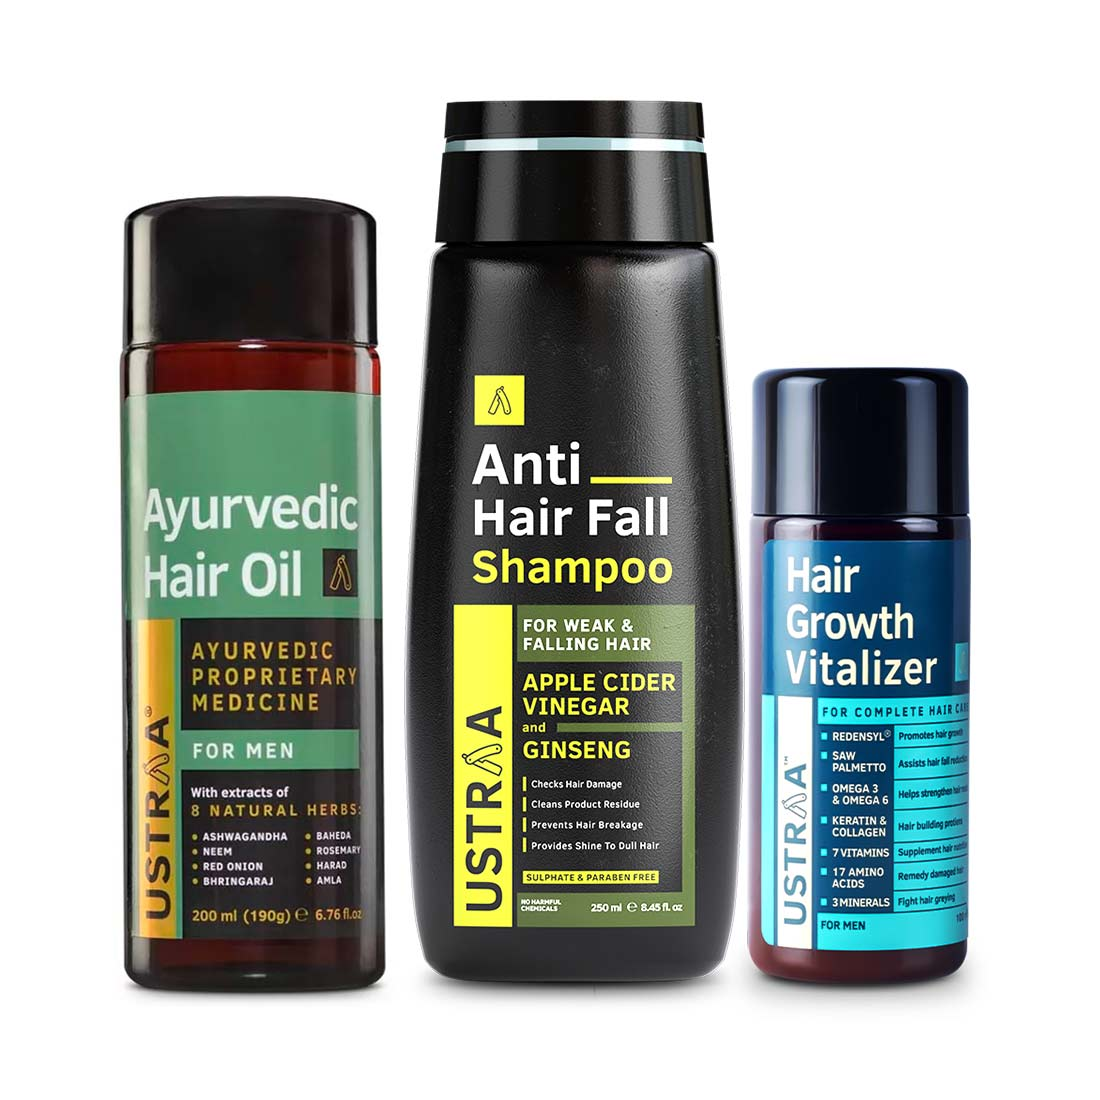 Ustraa | Ustraa Hair Growth Vitalizer 100 ml, Anti hair fall Shampoo 250 ml  & Ayurvedic Hair Oil 200 ml